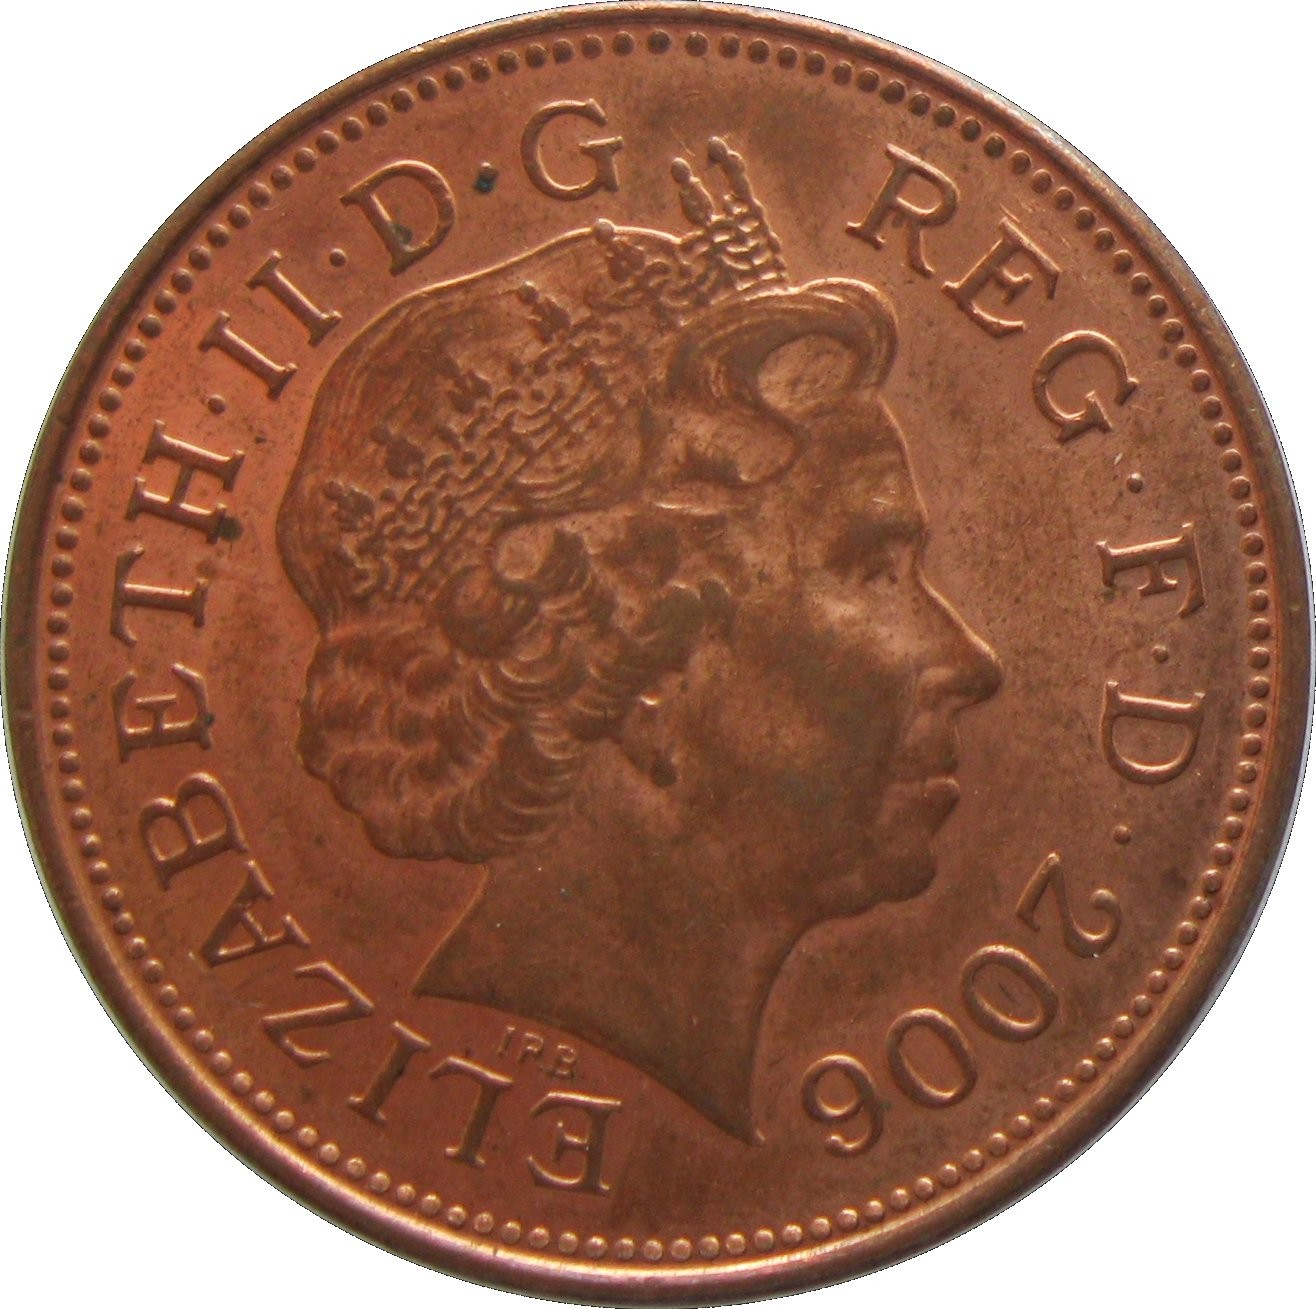 British 2 Pence